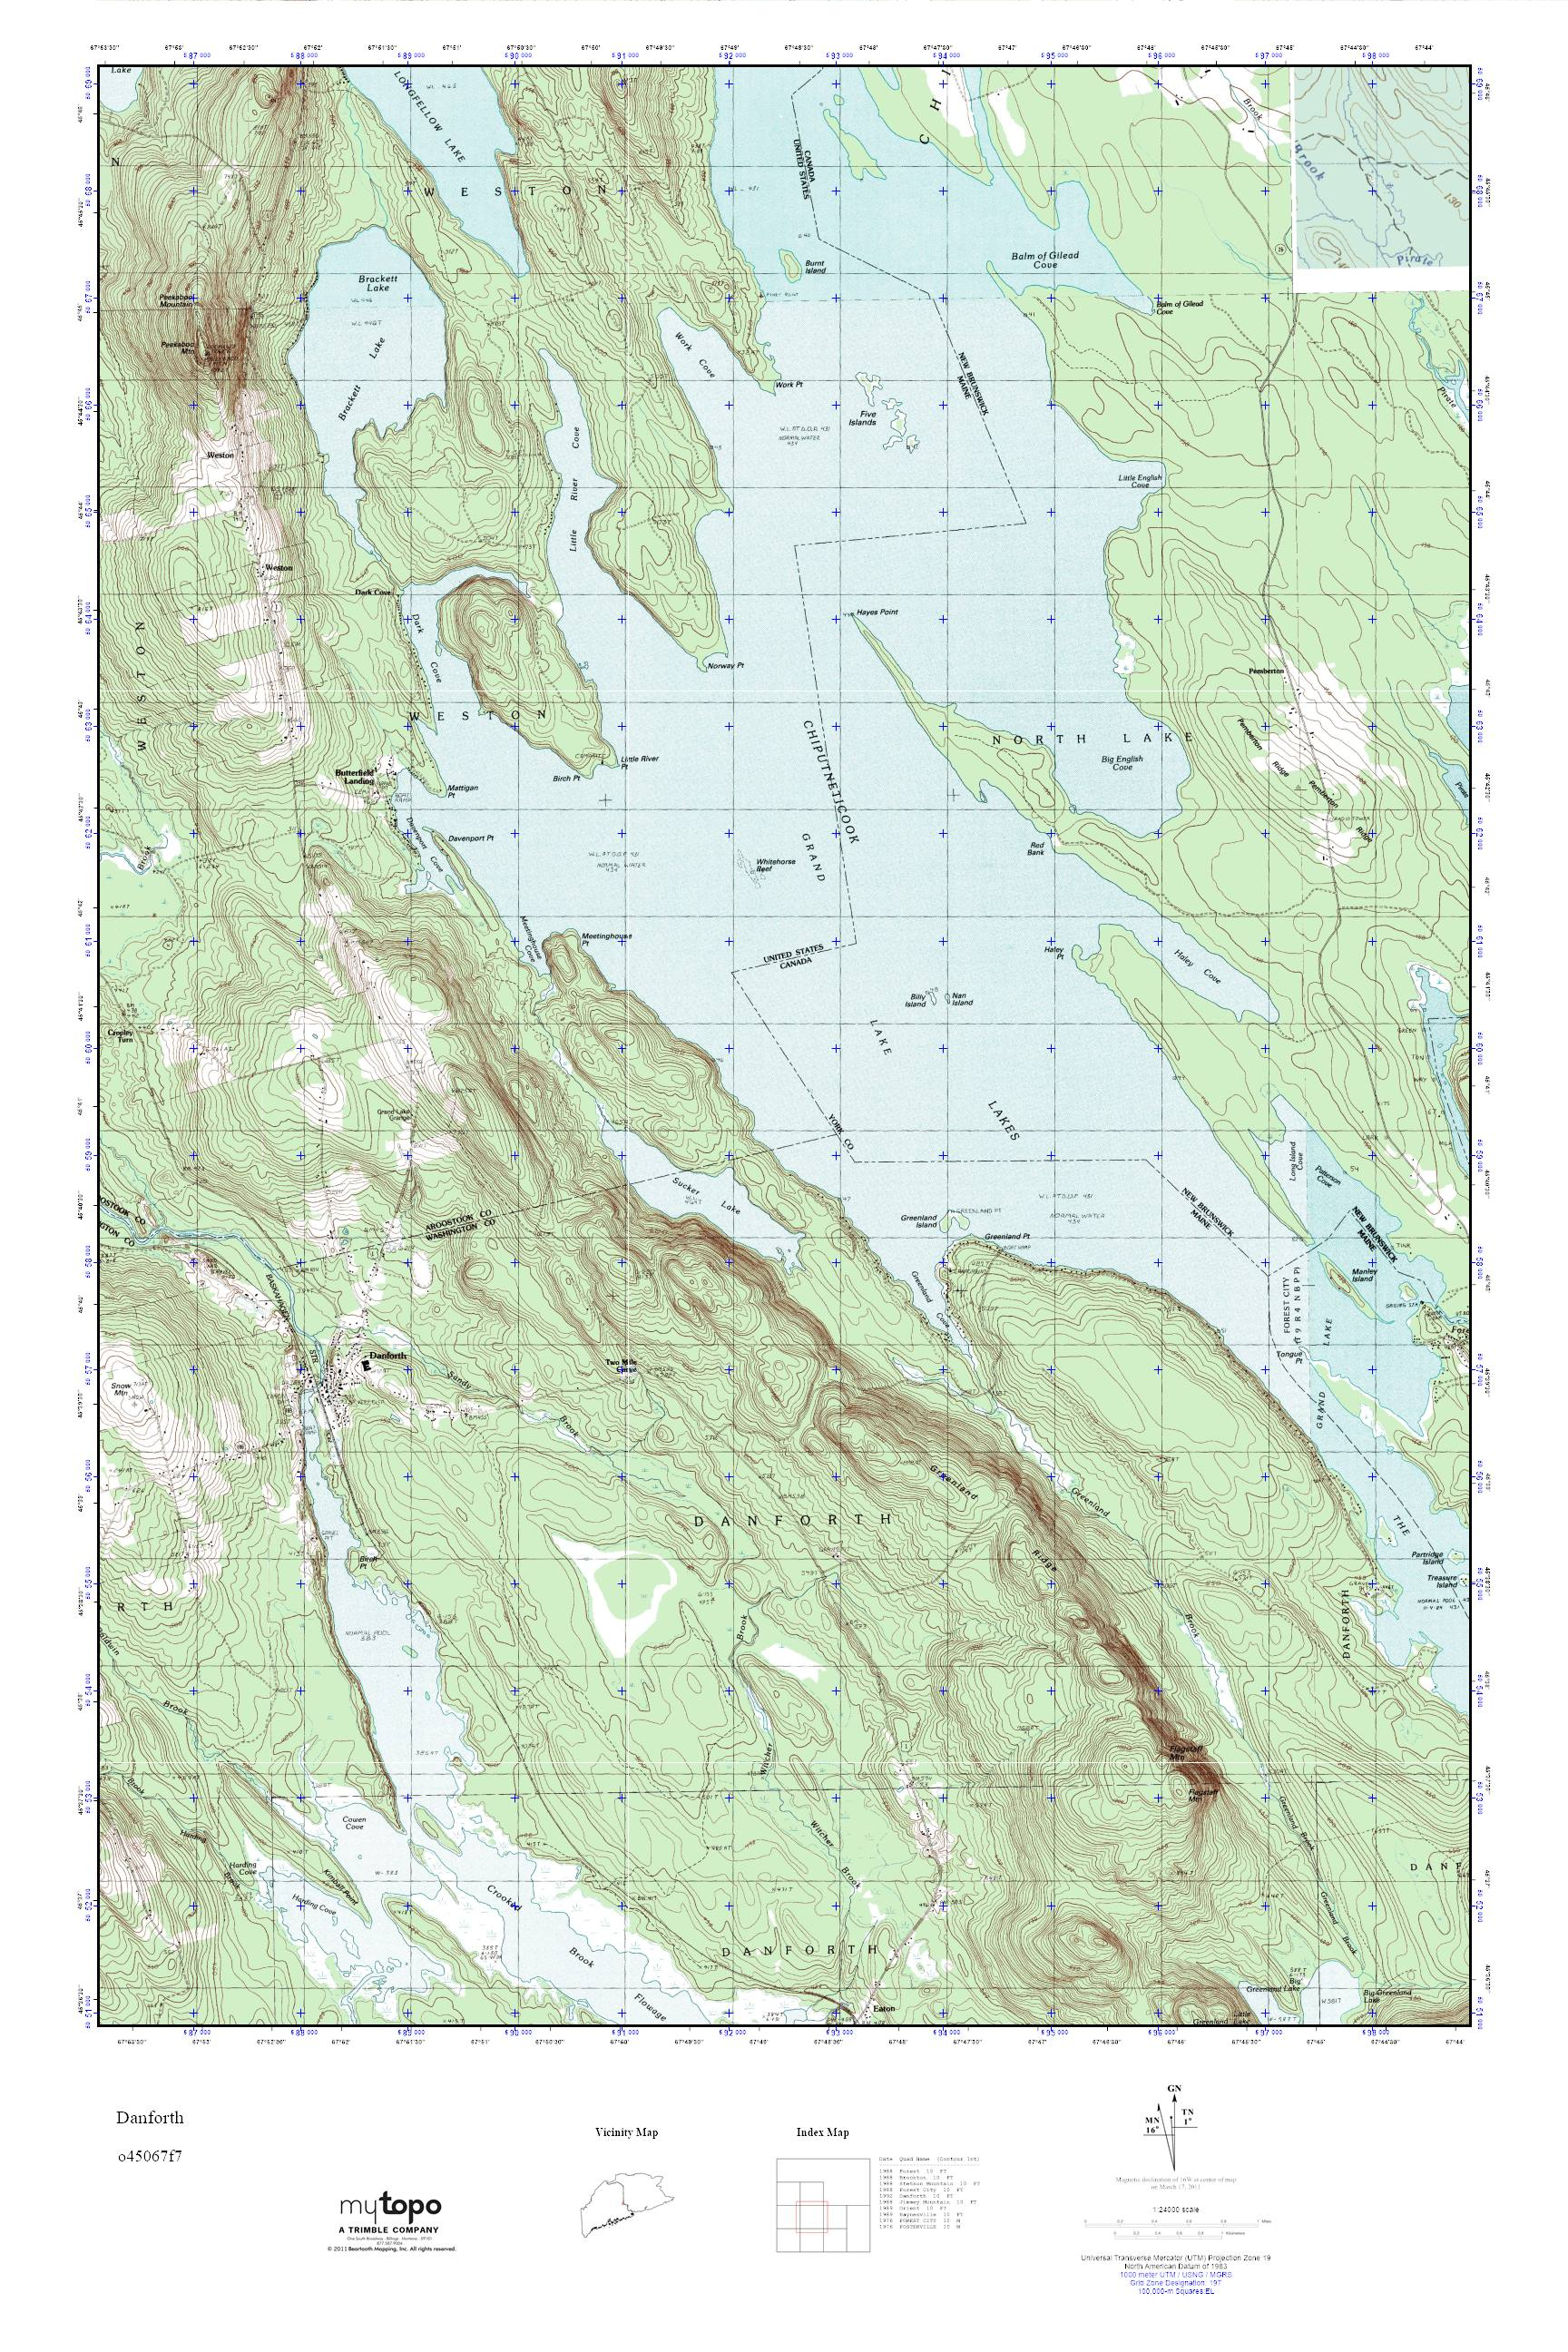 Danforth Maine Map.Mytopo Danforth Maine Usgs Quad Topo Map